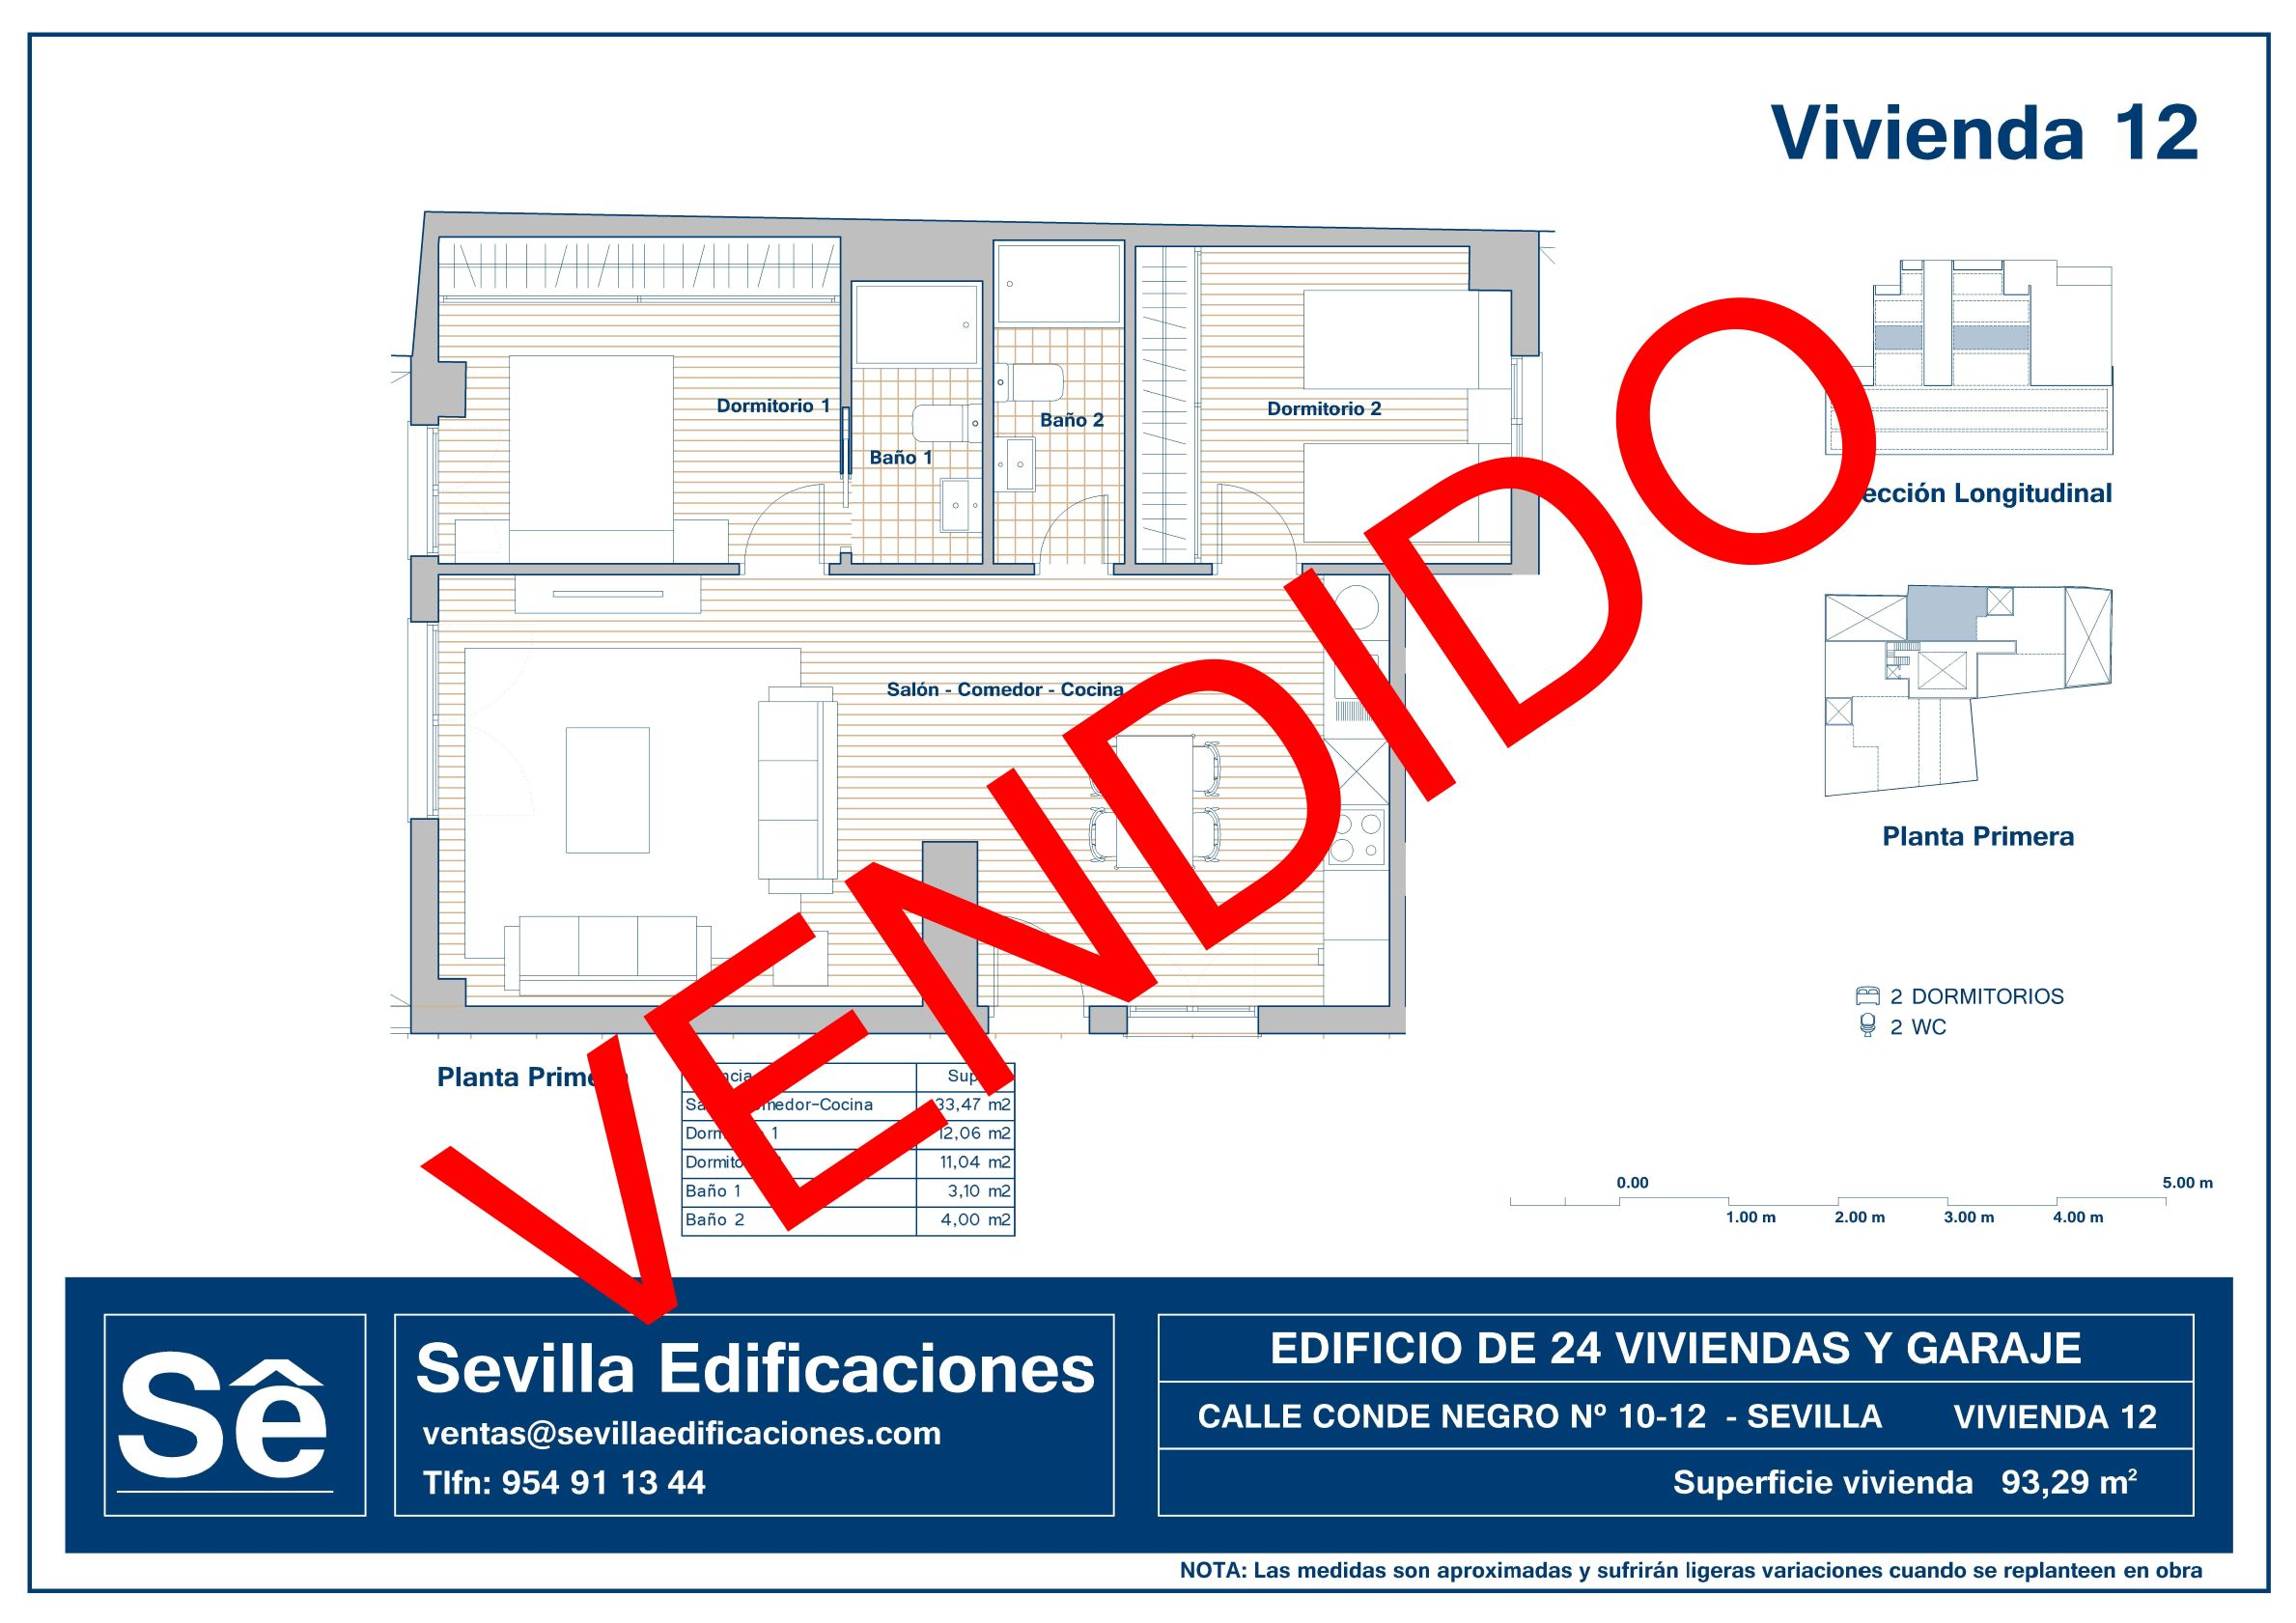 CONDENEGRO_VIVIENDA_12_VENDIDO